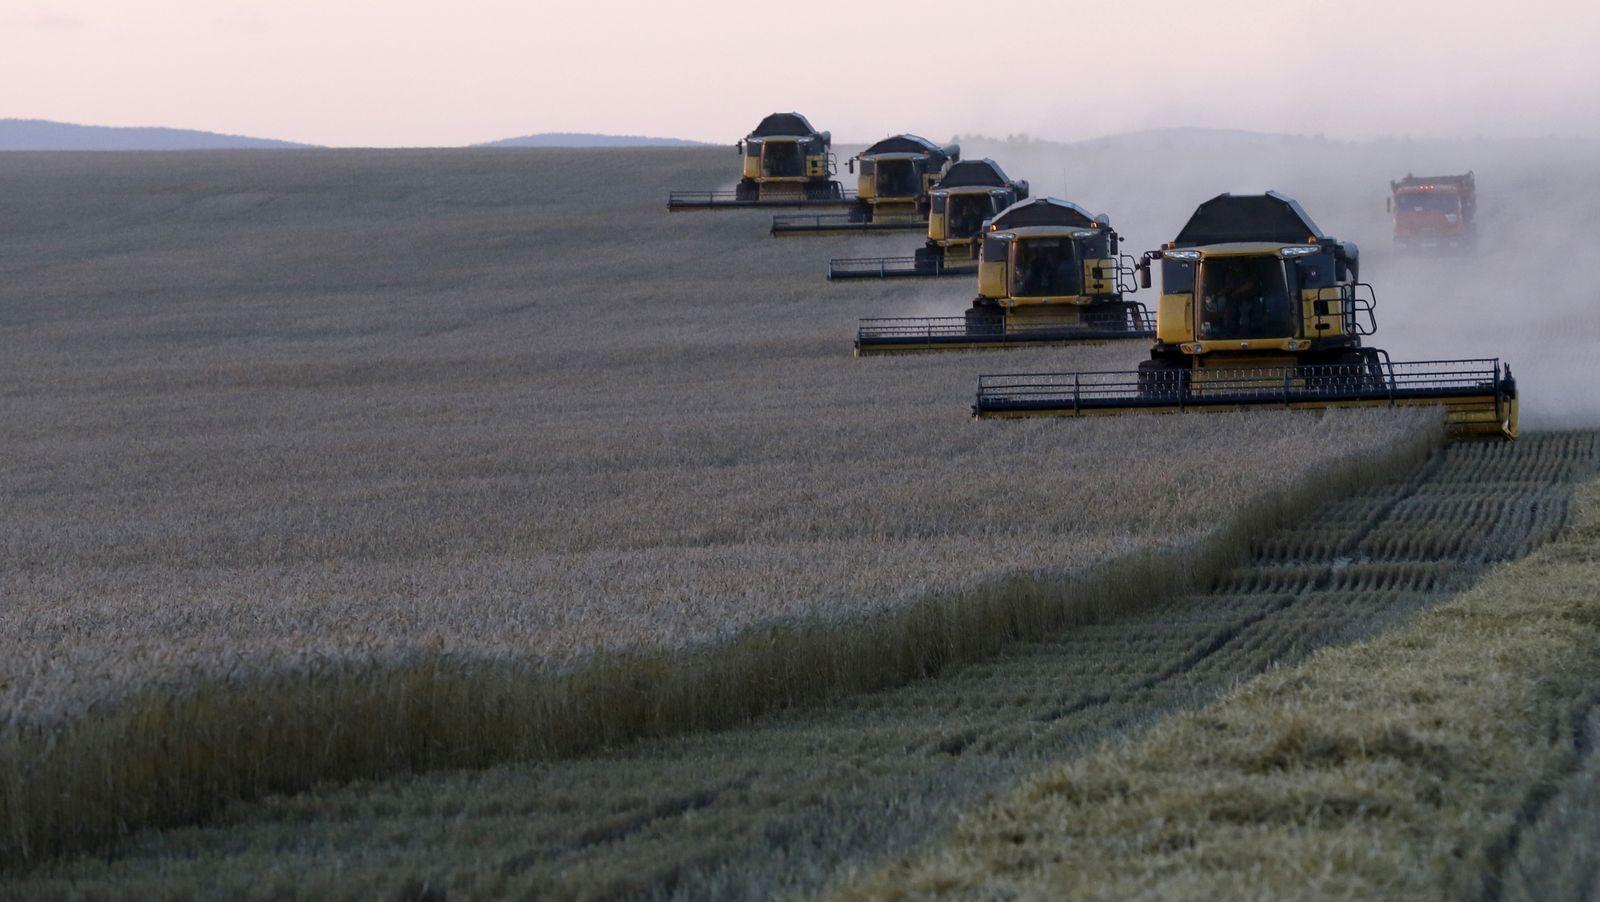 Combine harvesters work on wheat field of Solgonskoye farming company near village of Talniki southwest from Krasnoyarsk